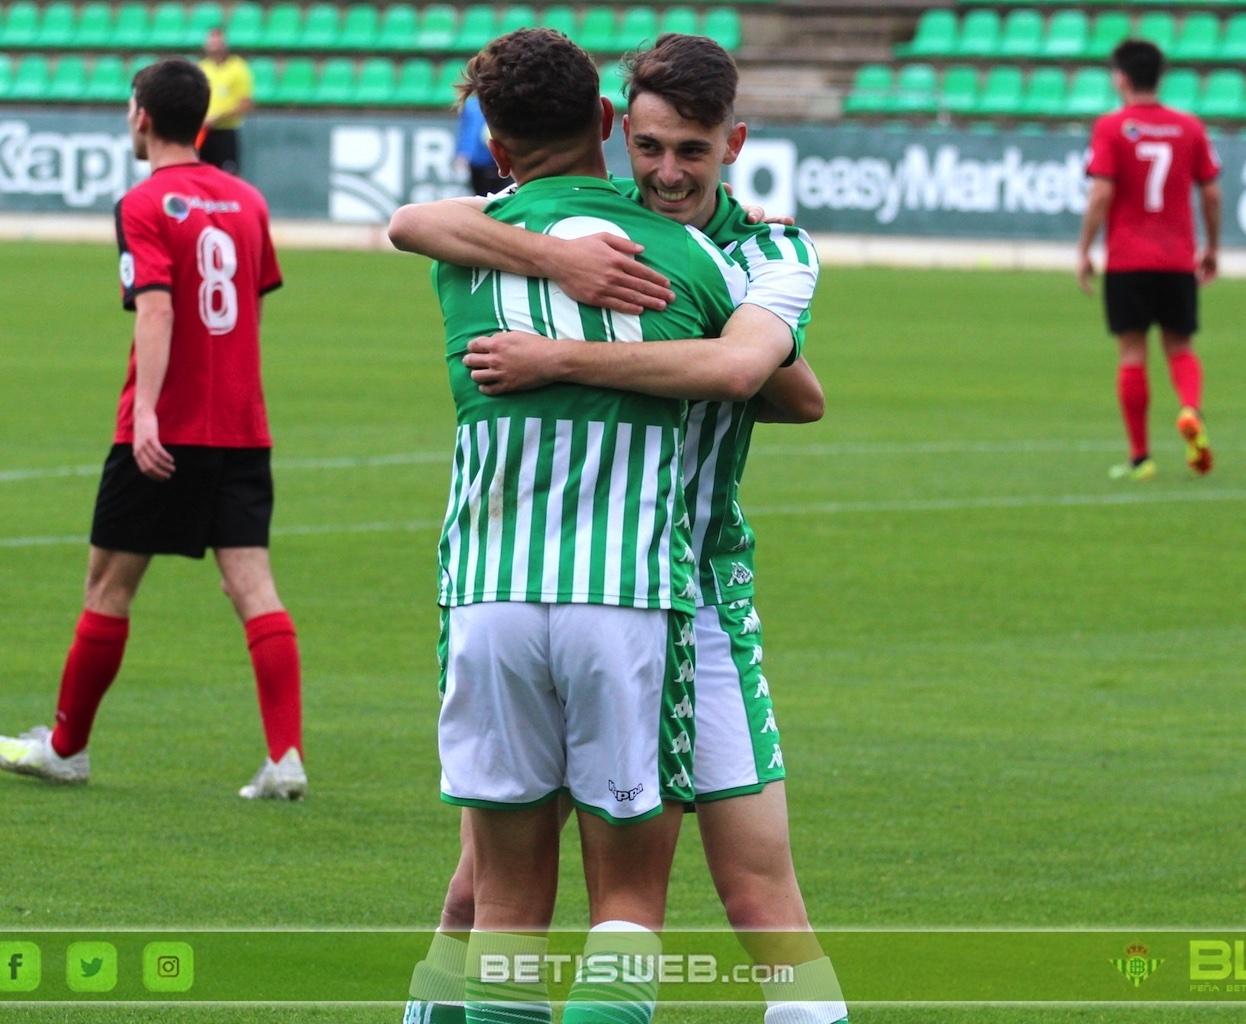 aJ18 - Betis Deportivo - Gerena 102